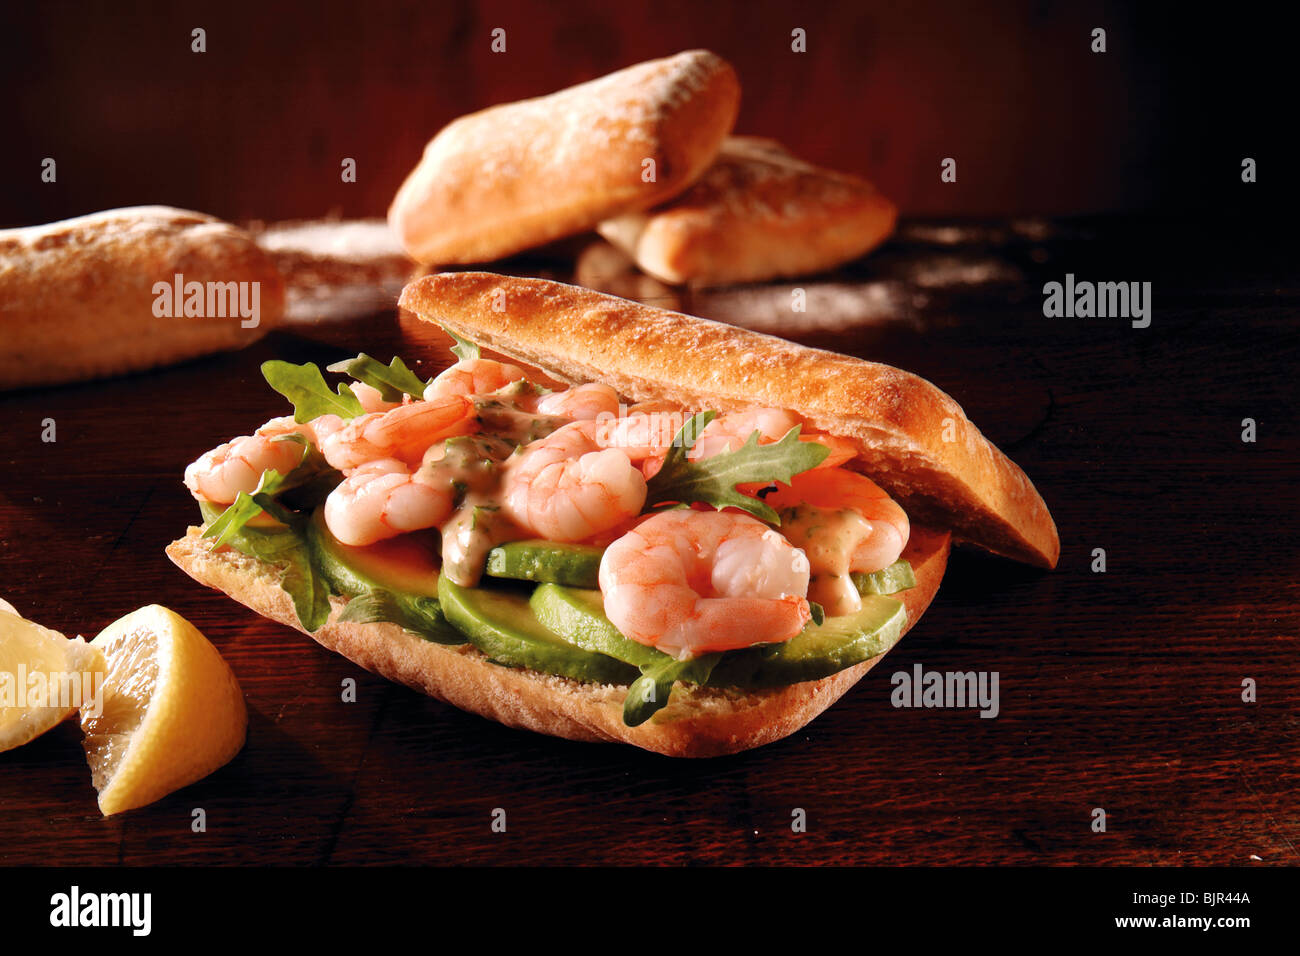 Prawn, avacado and rocket chiabatta sandwich. Food photos. - Stock Image